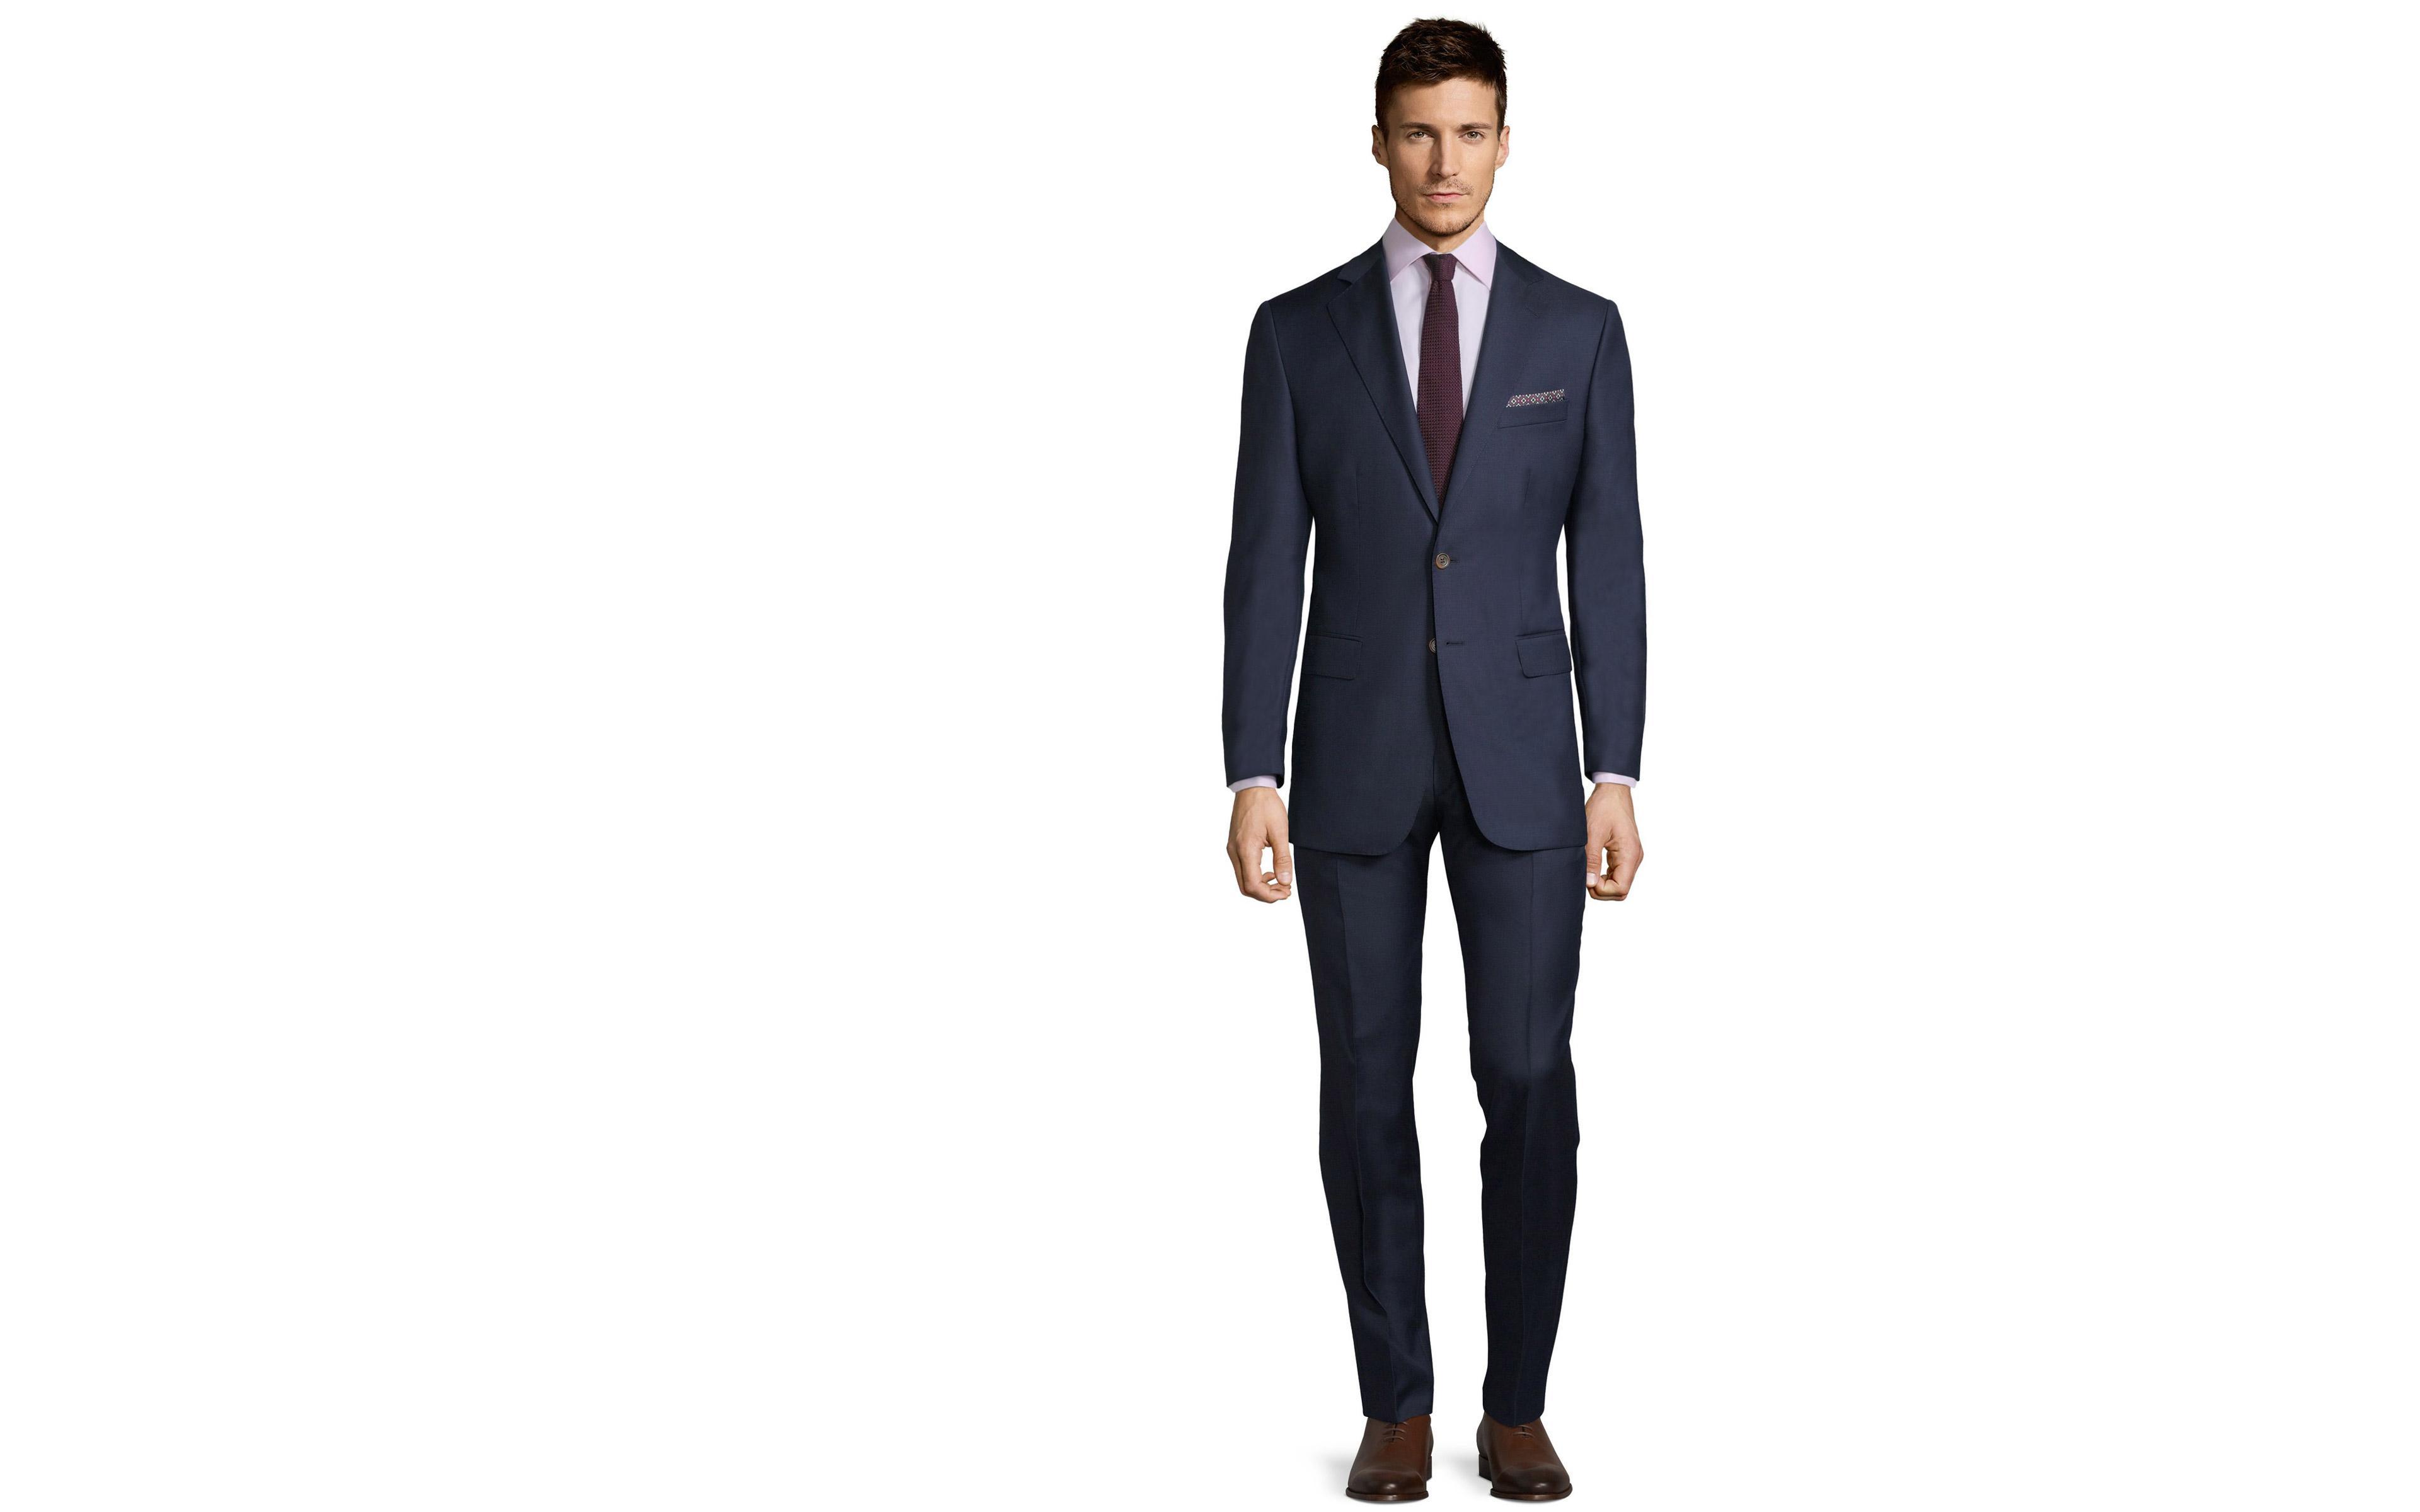 Suit in Navy Pick & Pick Wool